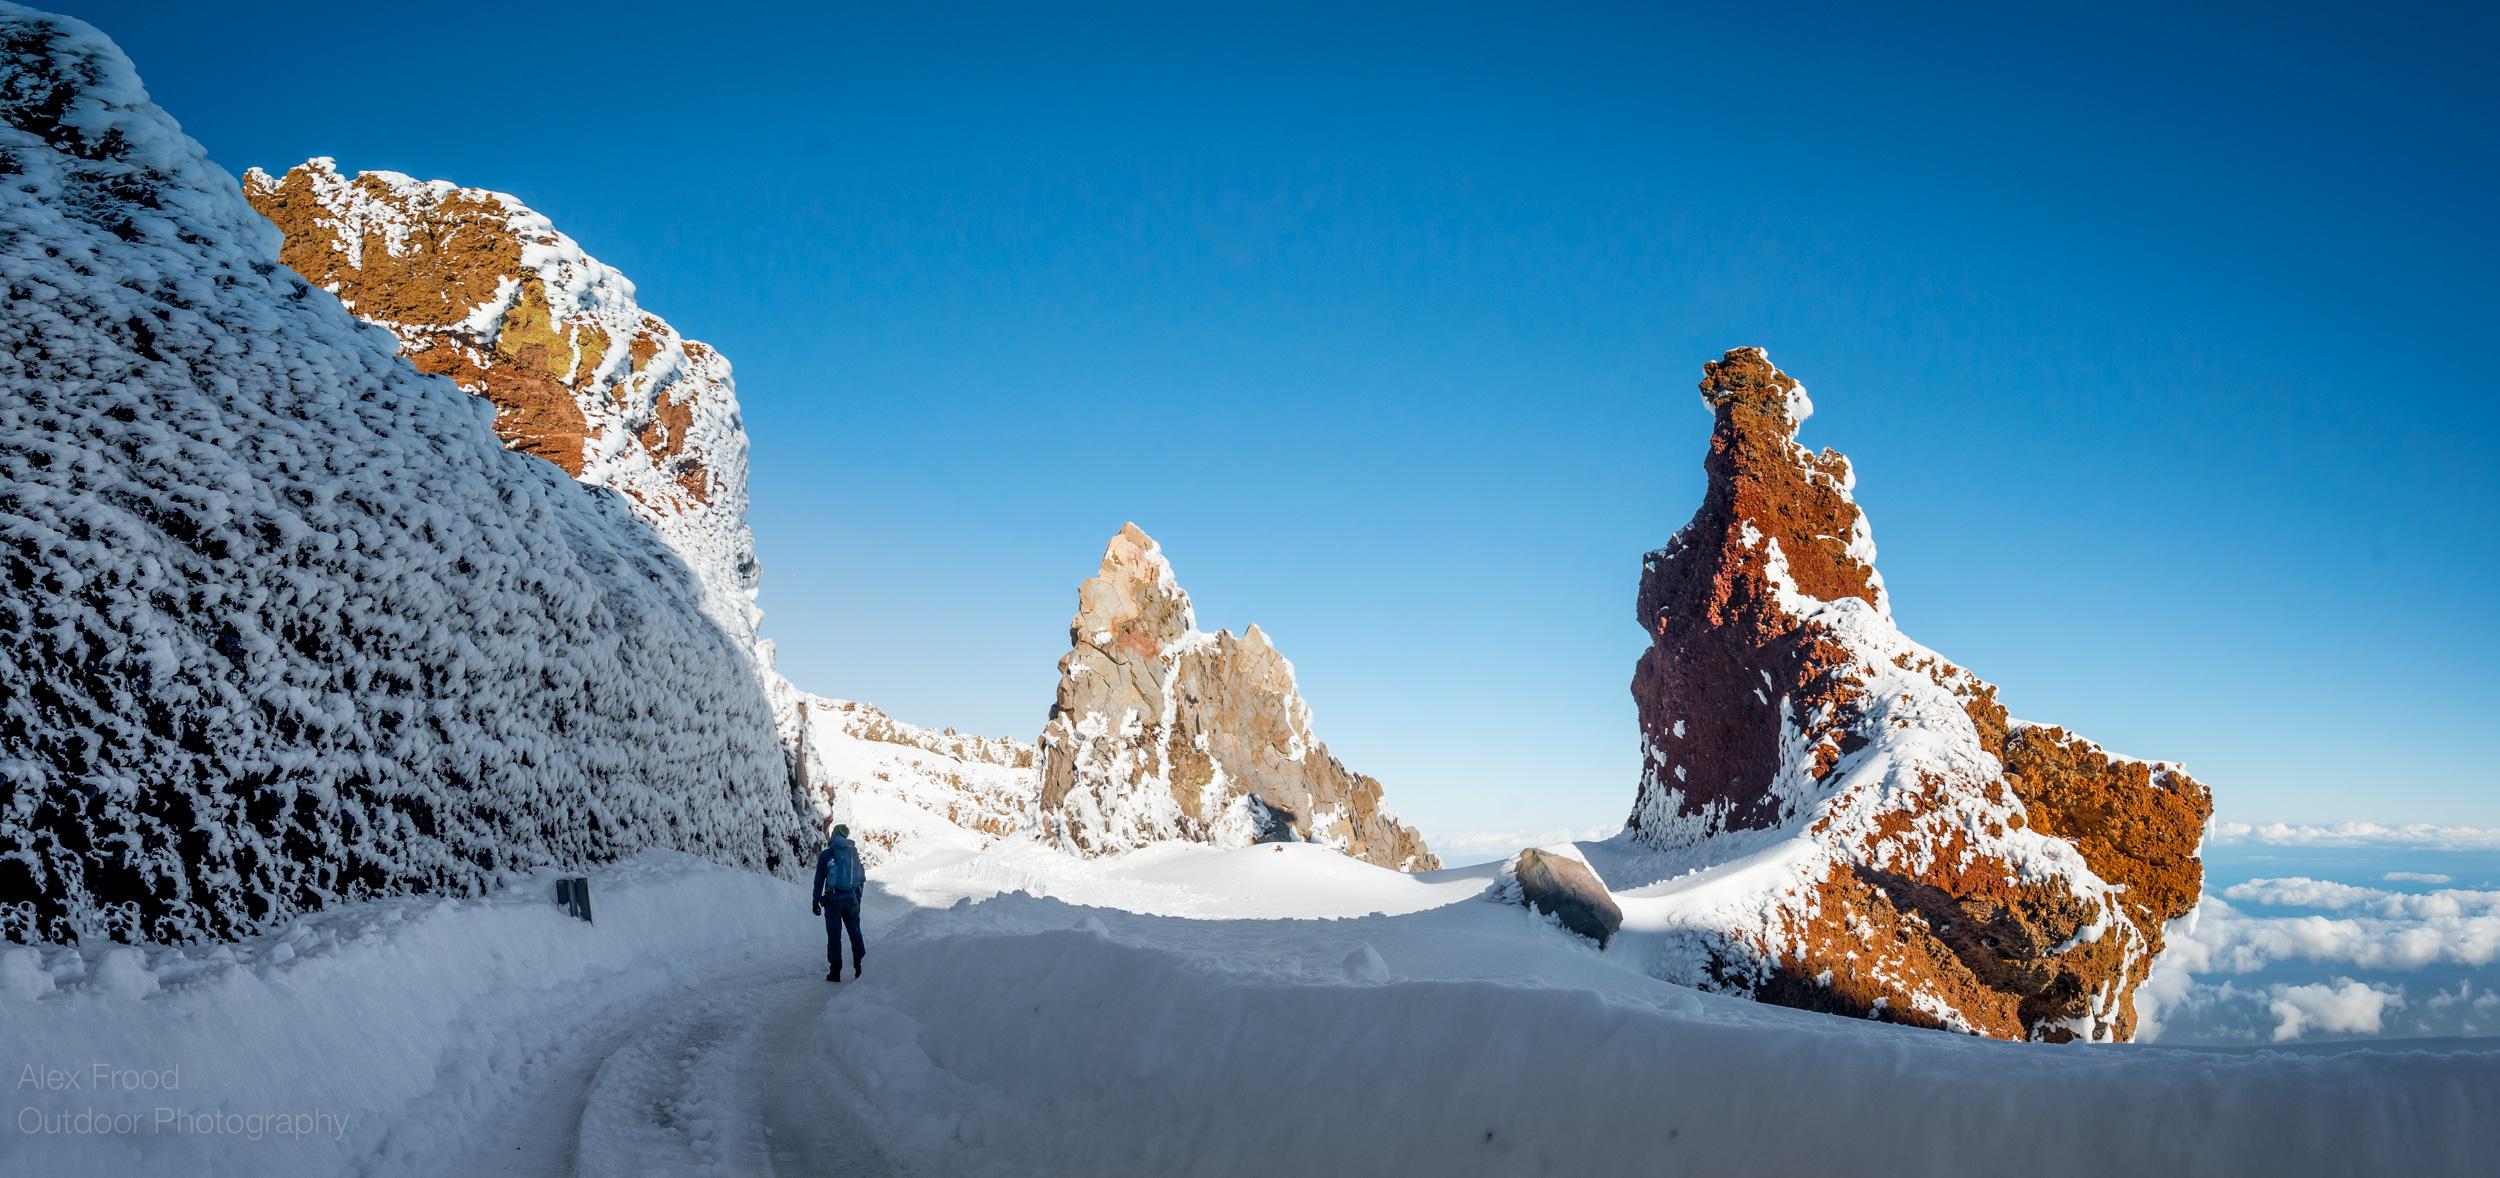 Fresh snow storm hit the highest peaks of La Palma